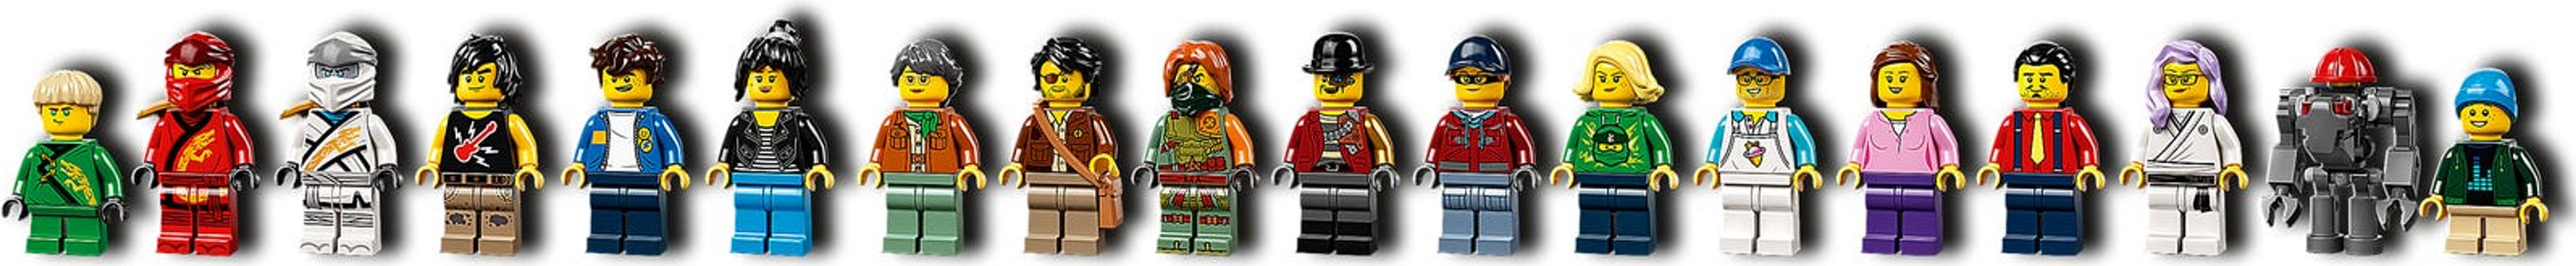 LEGO® Ninjago NINJAGO® City Gardens minifigures